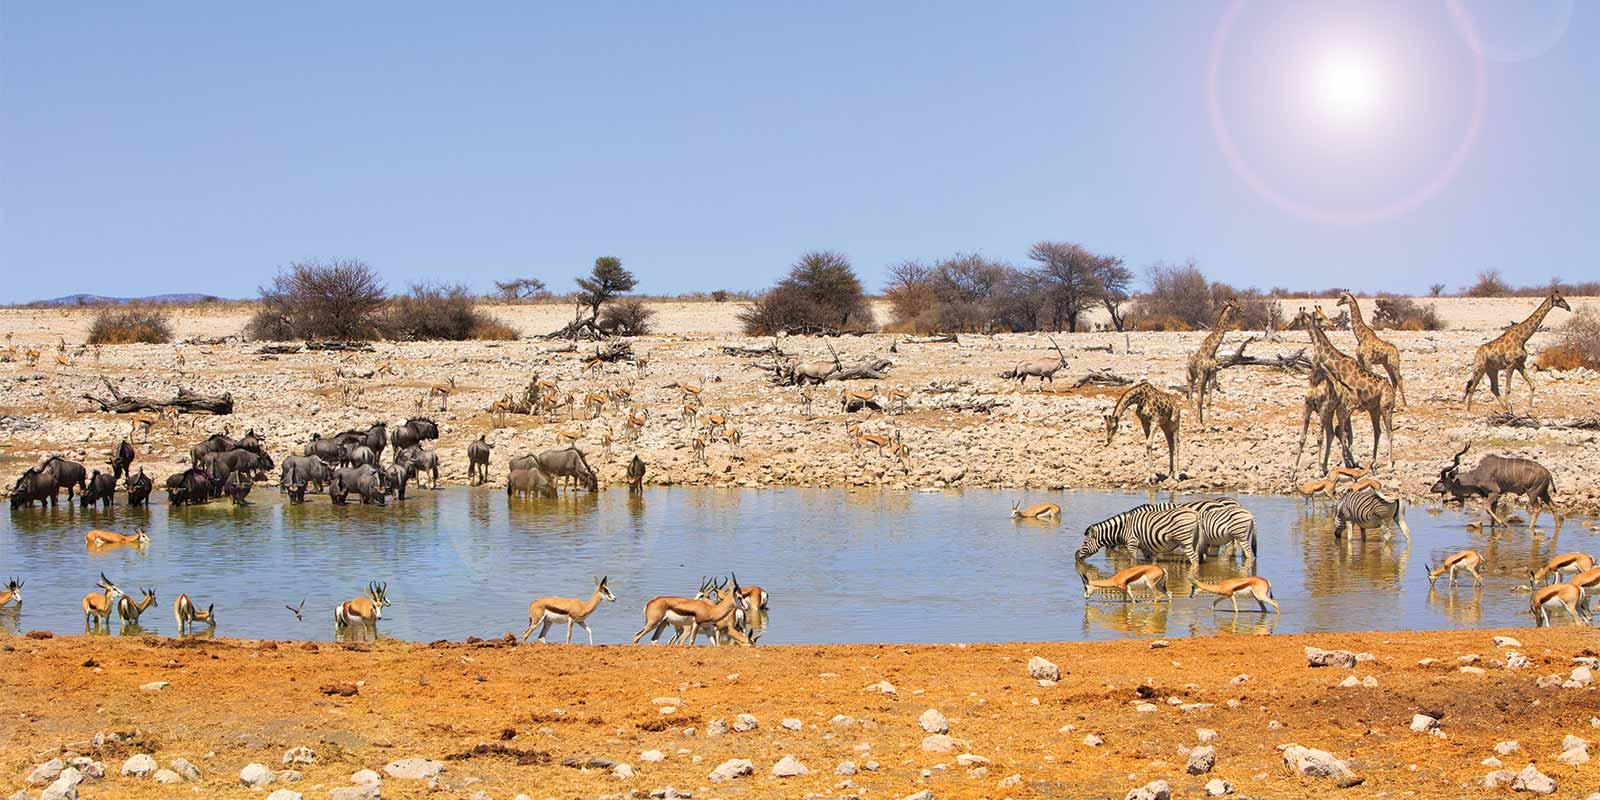 Zebra, springbok, wildebeest and giraffe at Okaukeujo waterhole